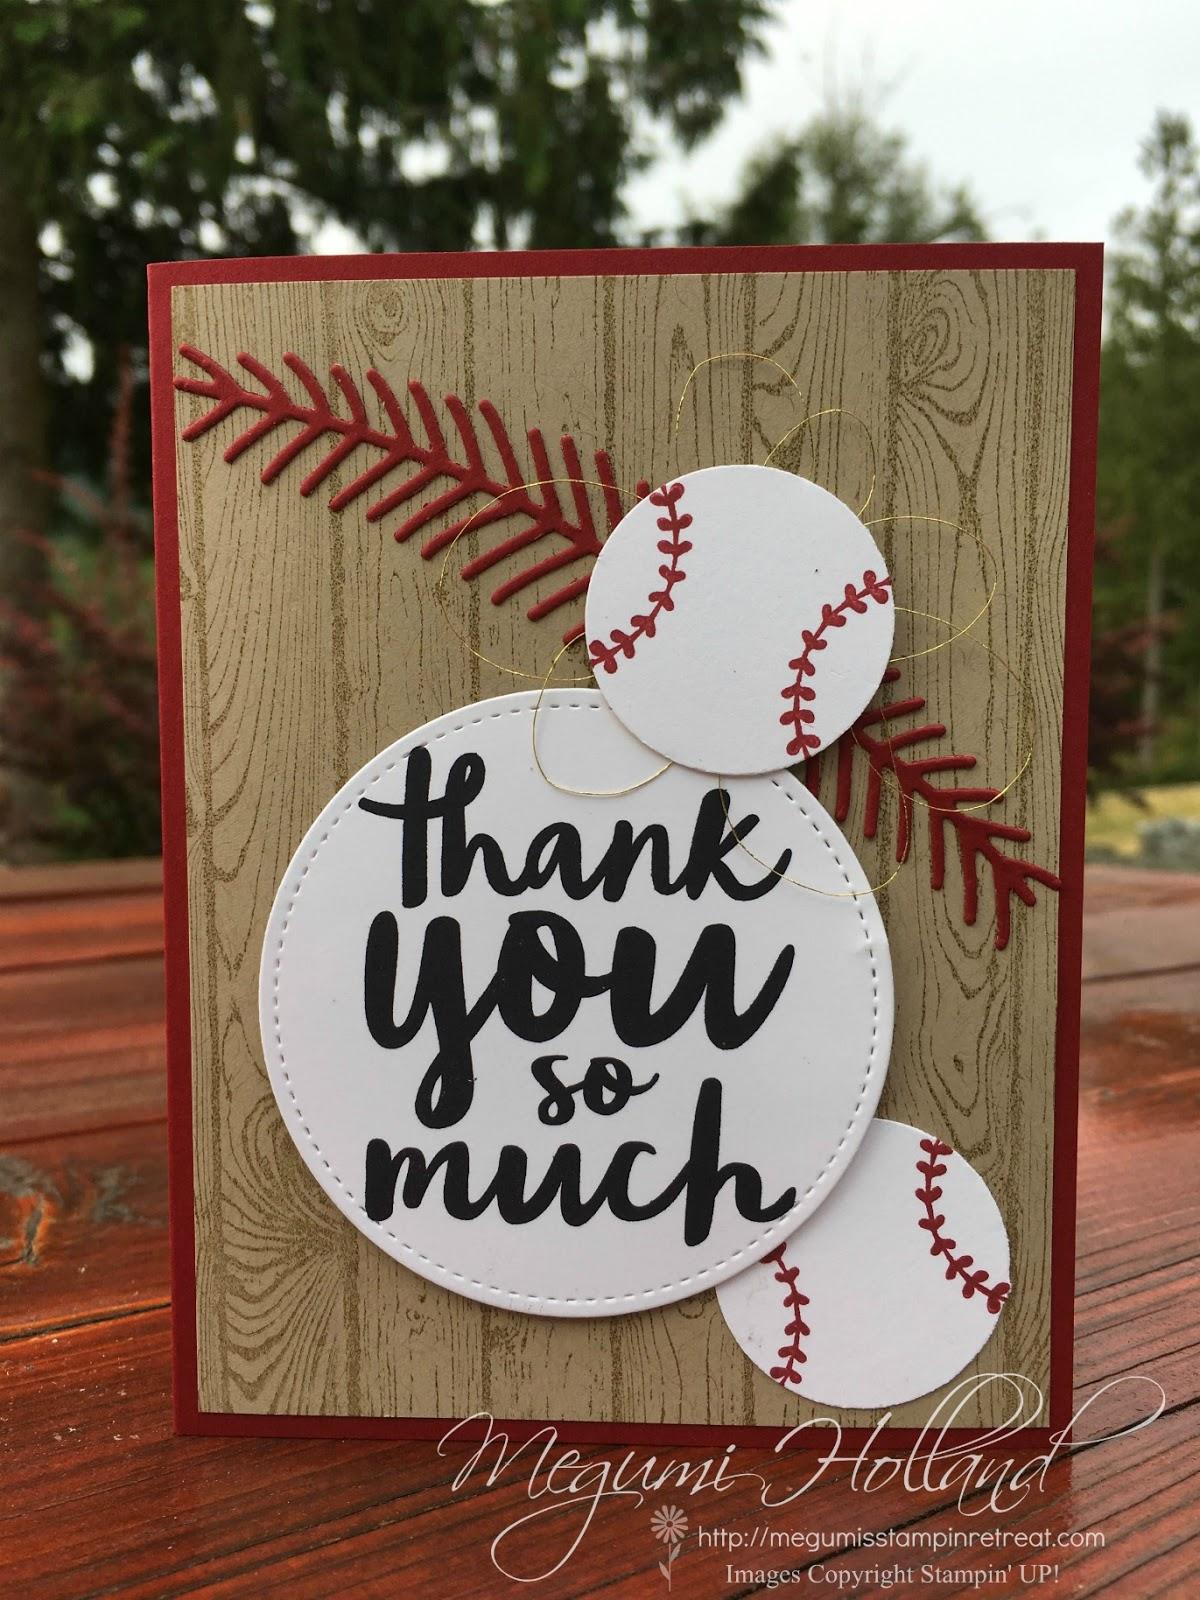 Megumis Stampin Retreat Christmas Pines Baseball Cards